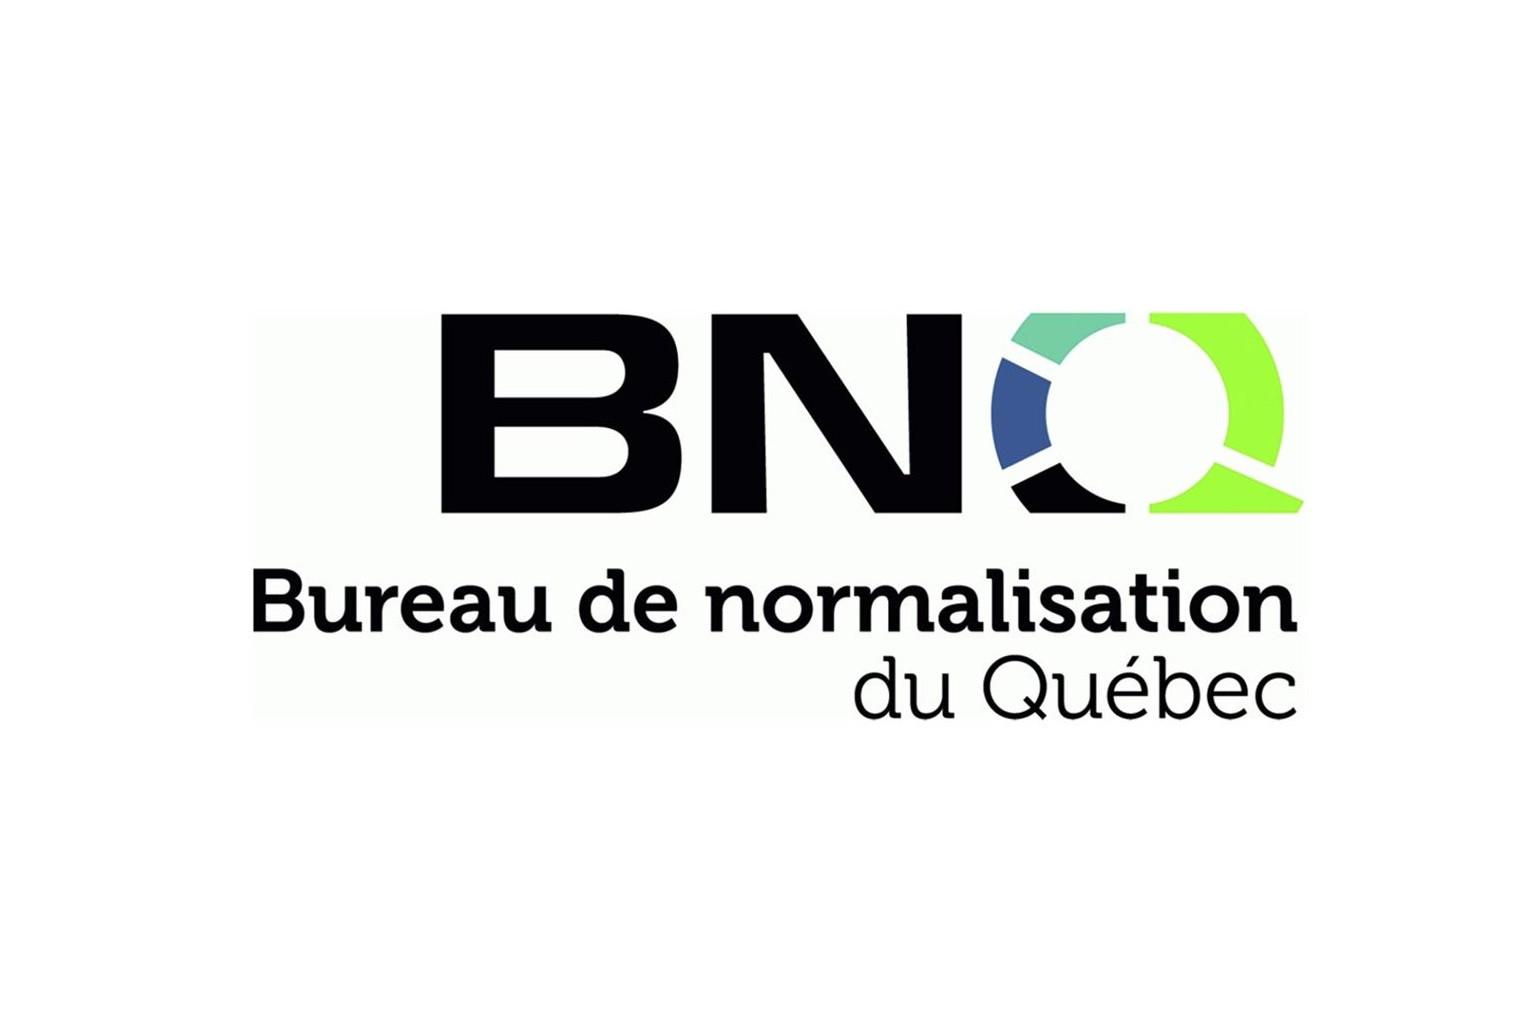 BNQ_LOGO2.jpg